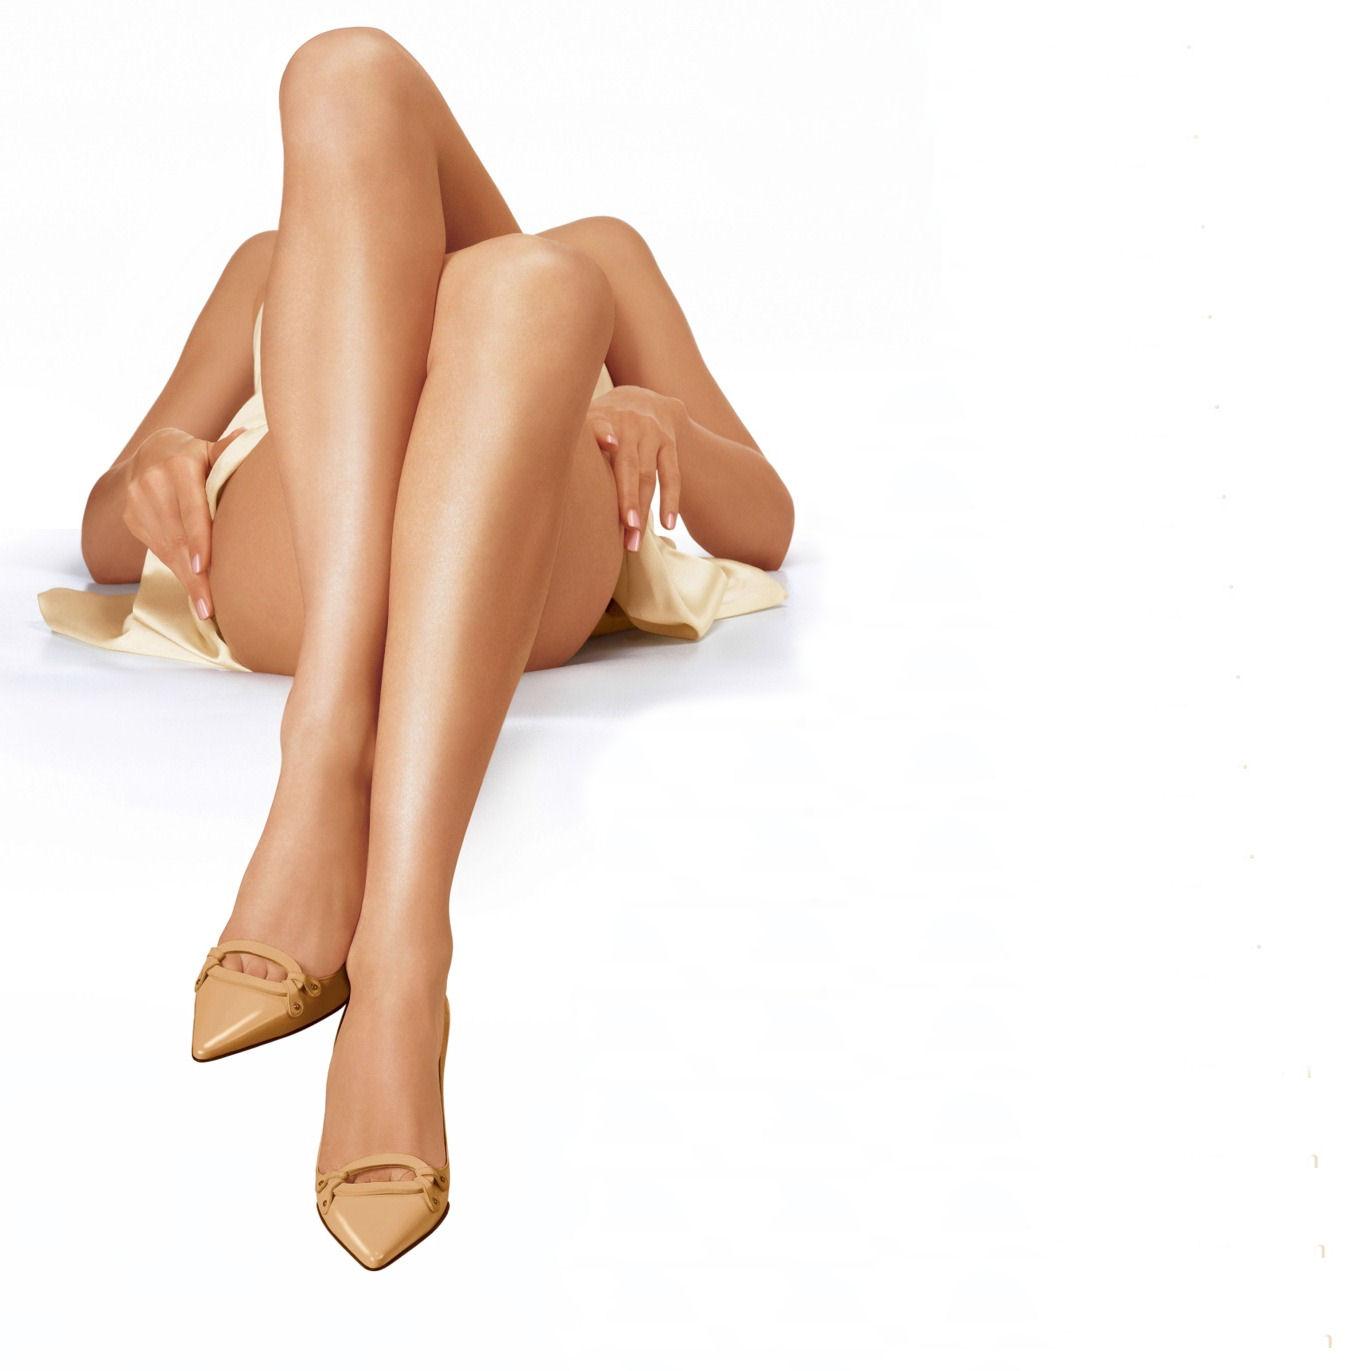 women's silky smooth legs